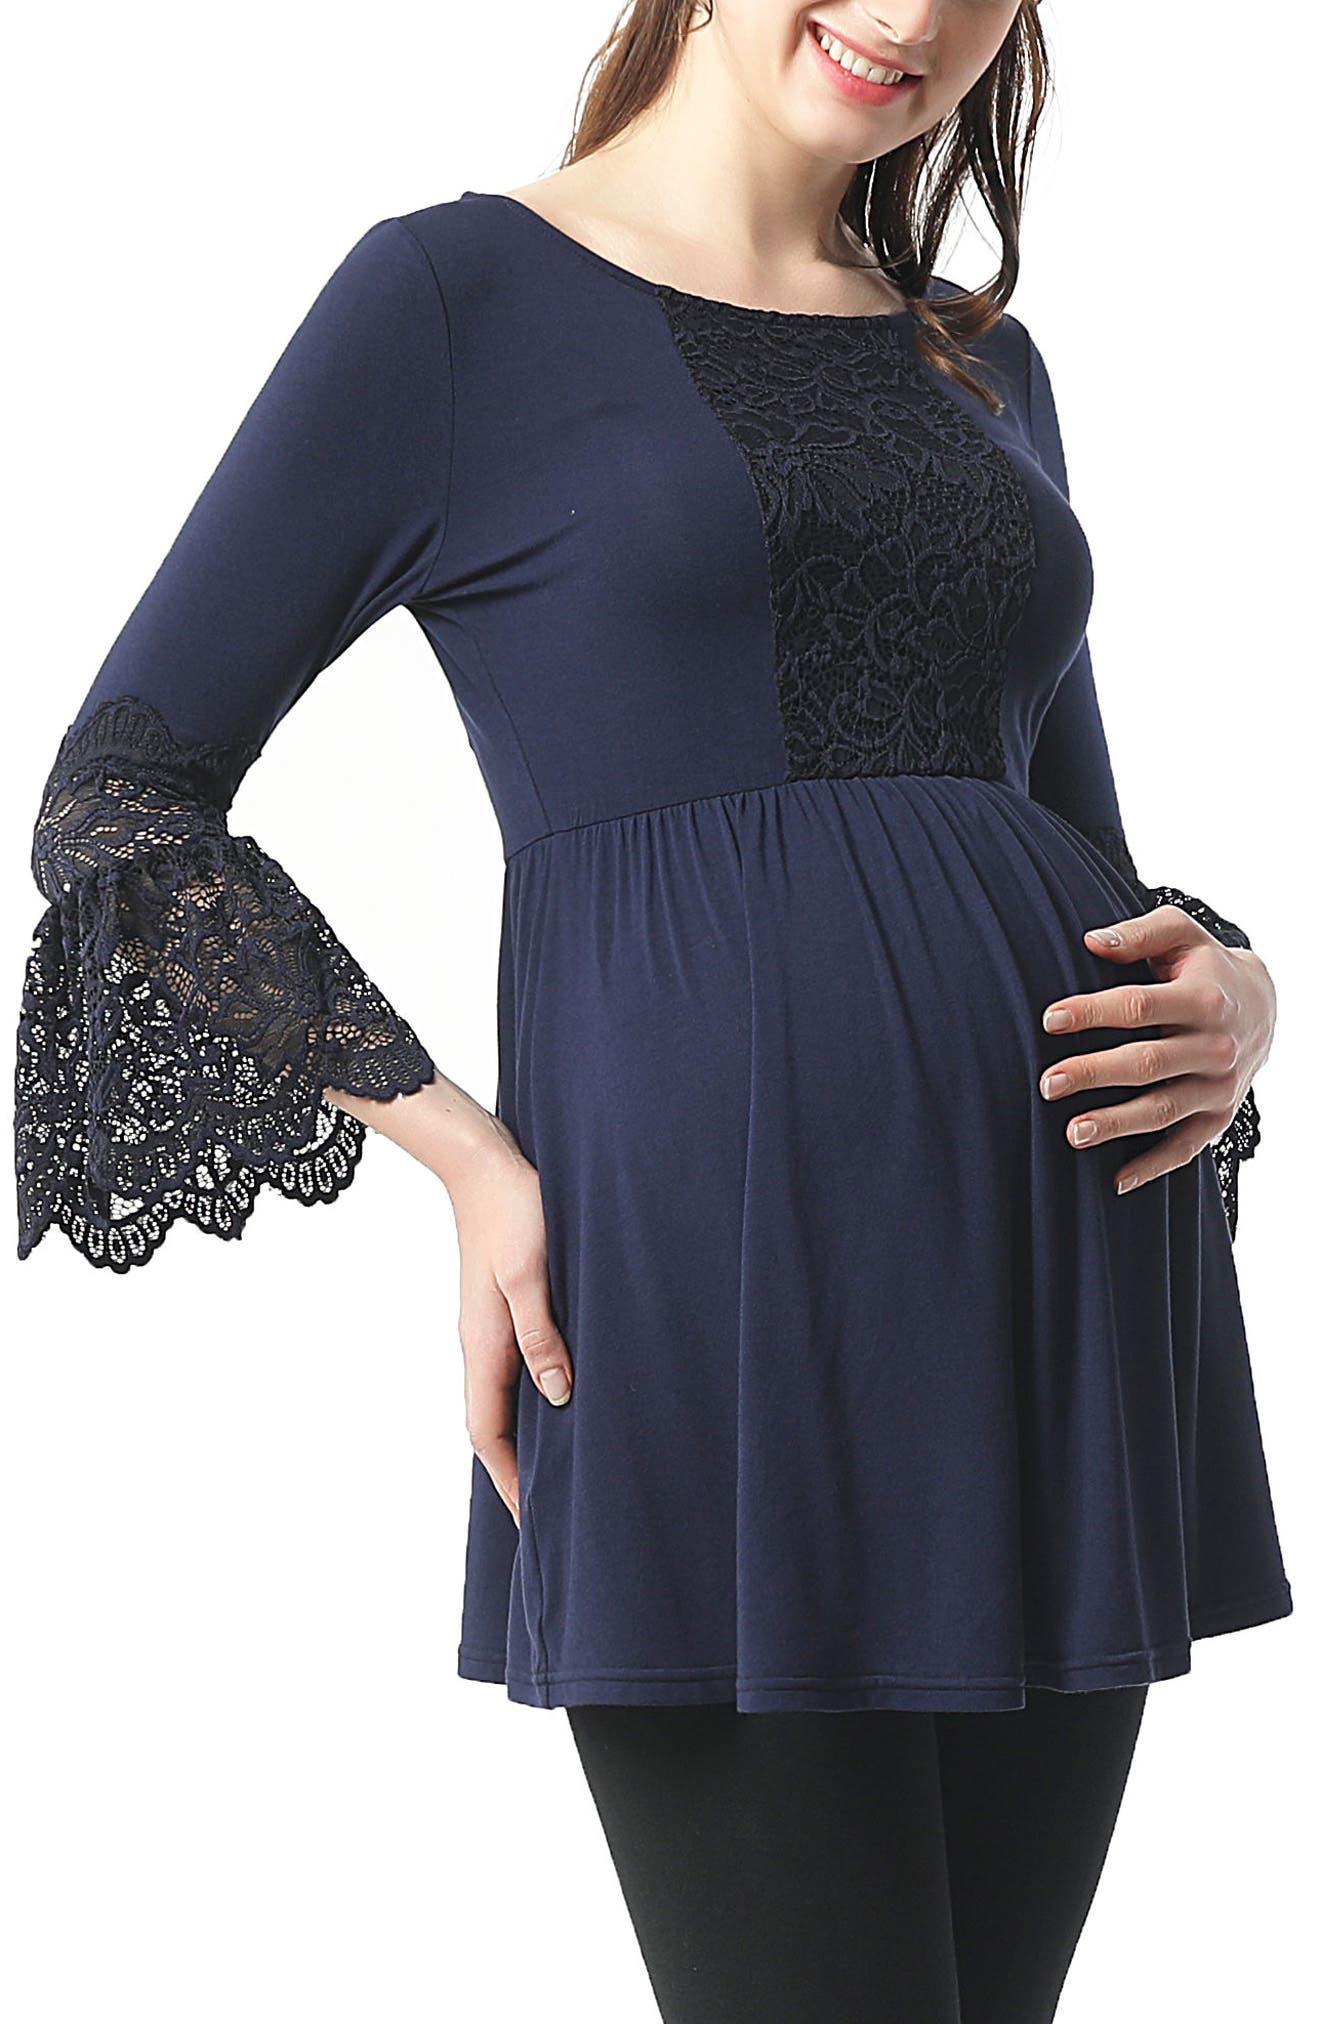 Alexis Bell Sleeve Babydoll Maternity Top,                             Main thumbnail 1, color,                             NAVY